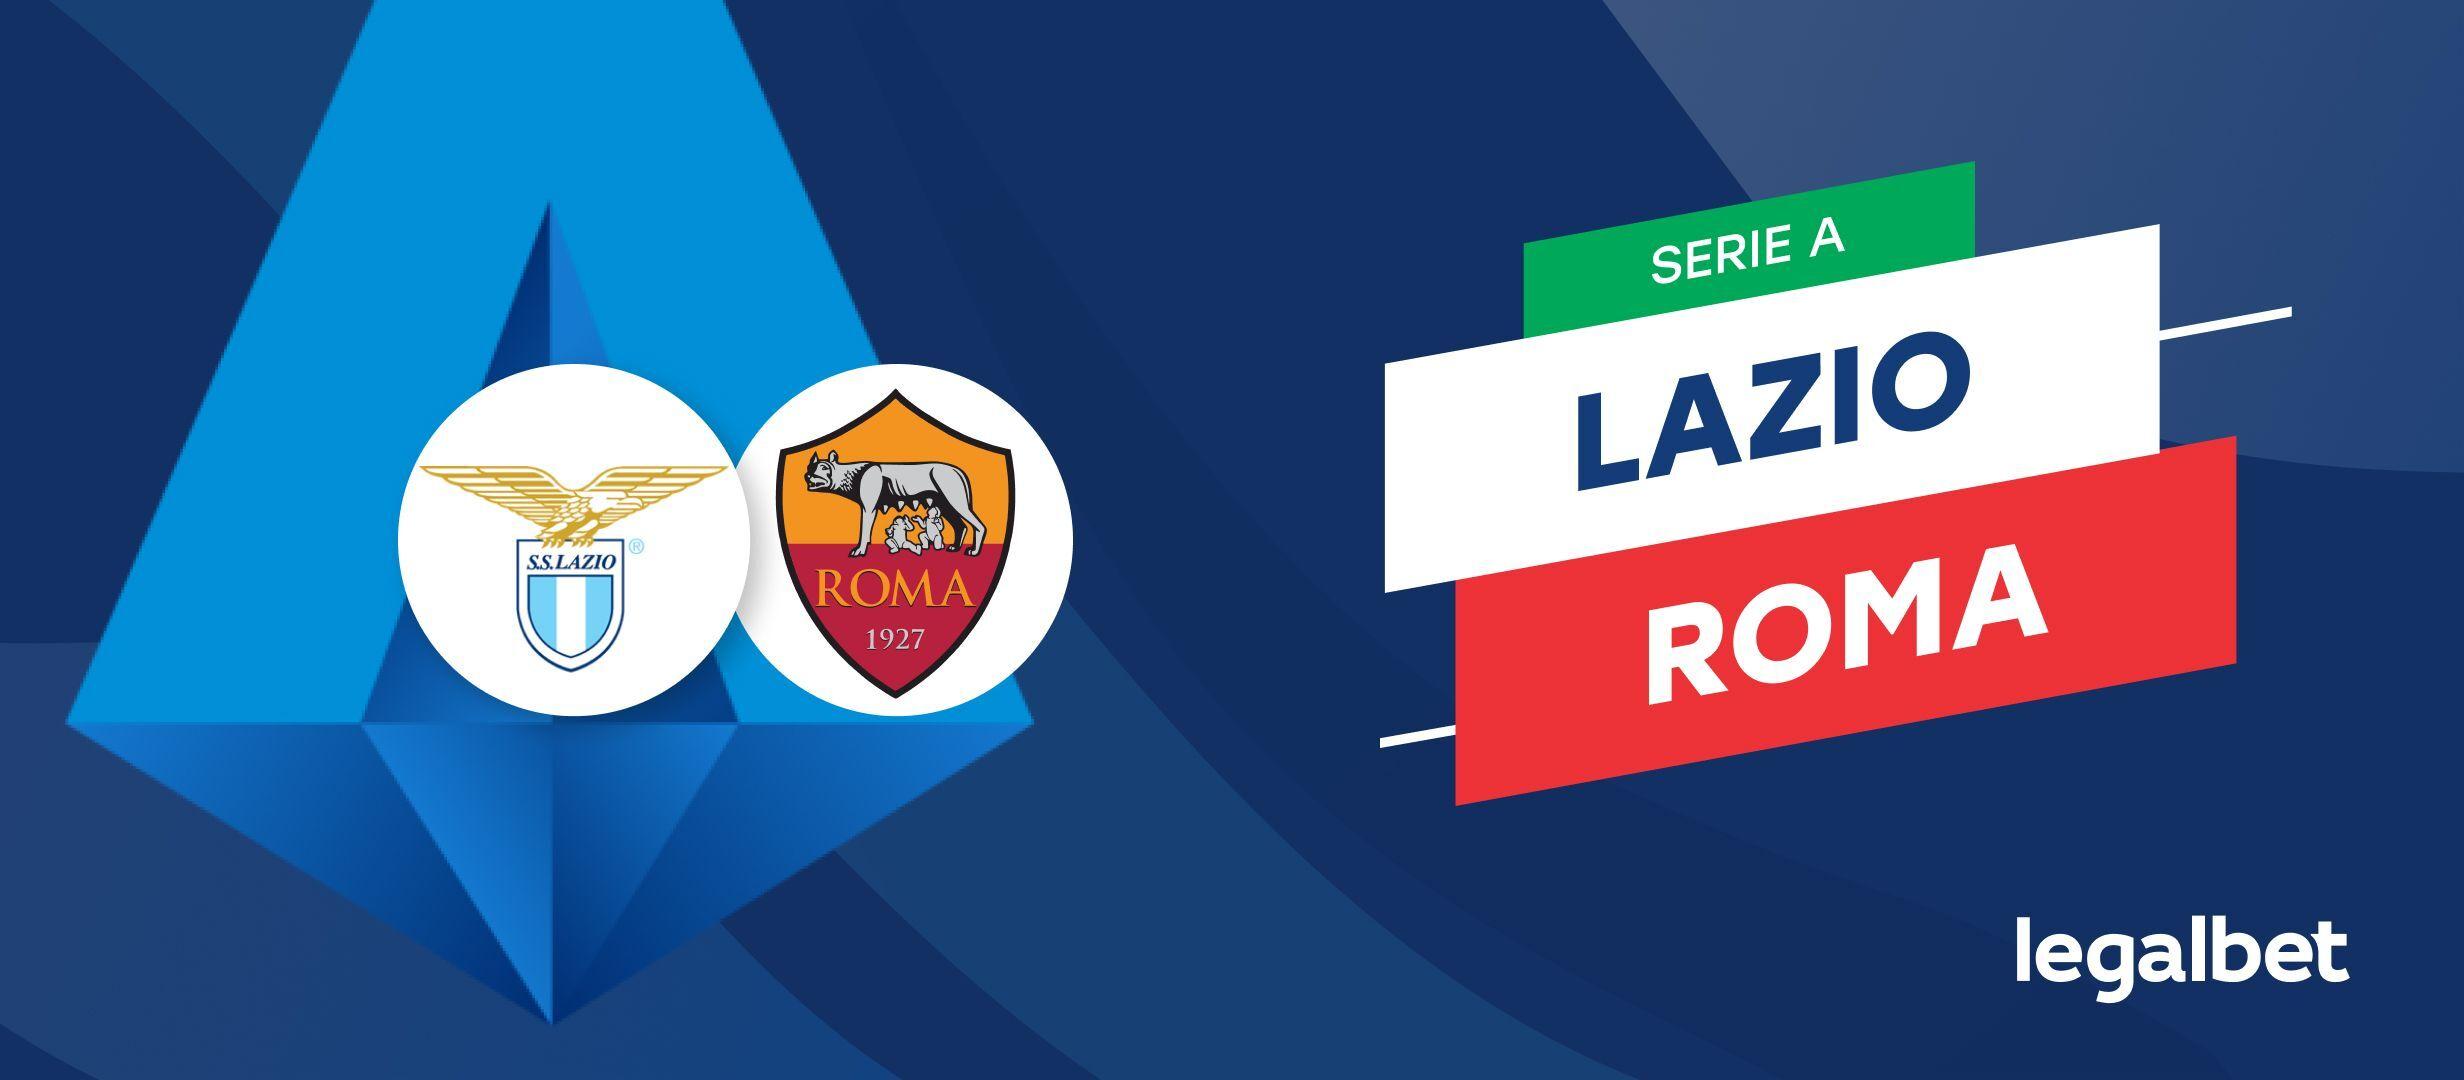 Lazio  - AS Roma, cote la pariuri, ponturi şi informaţii